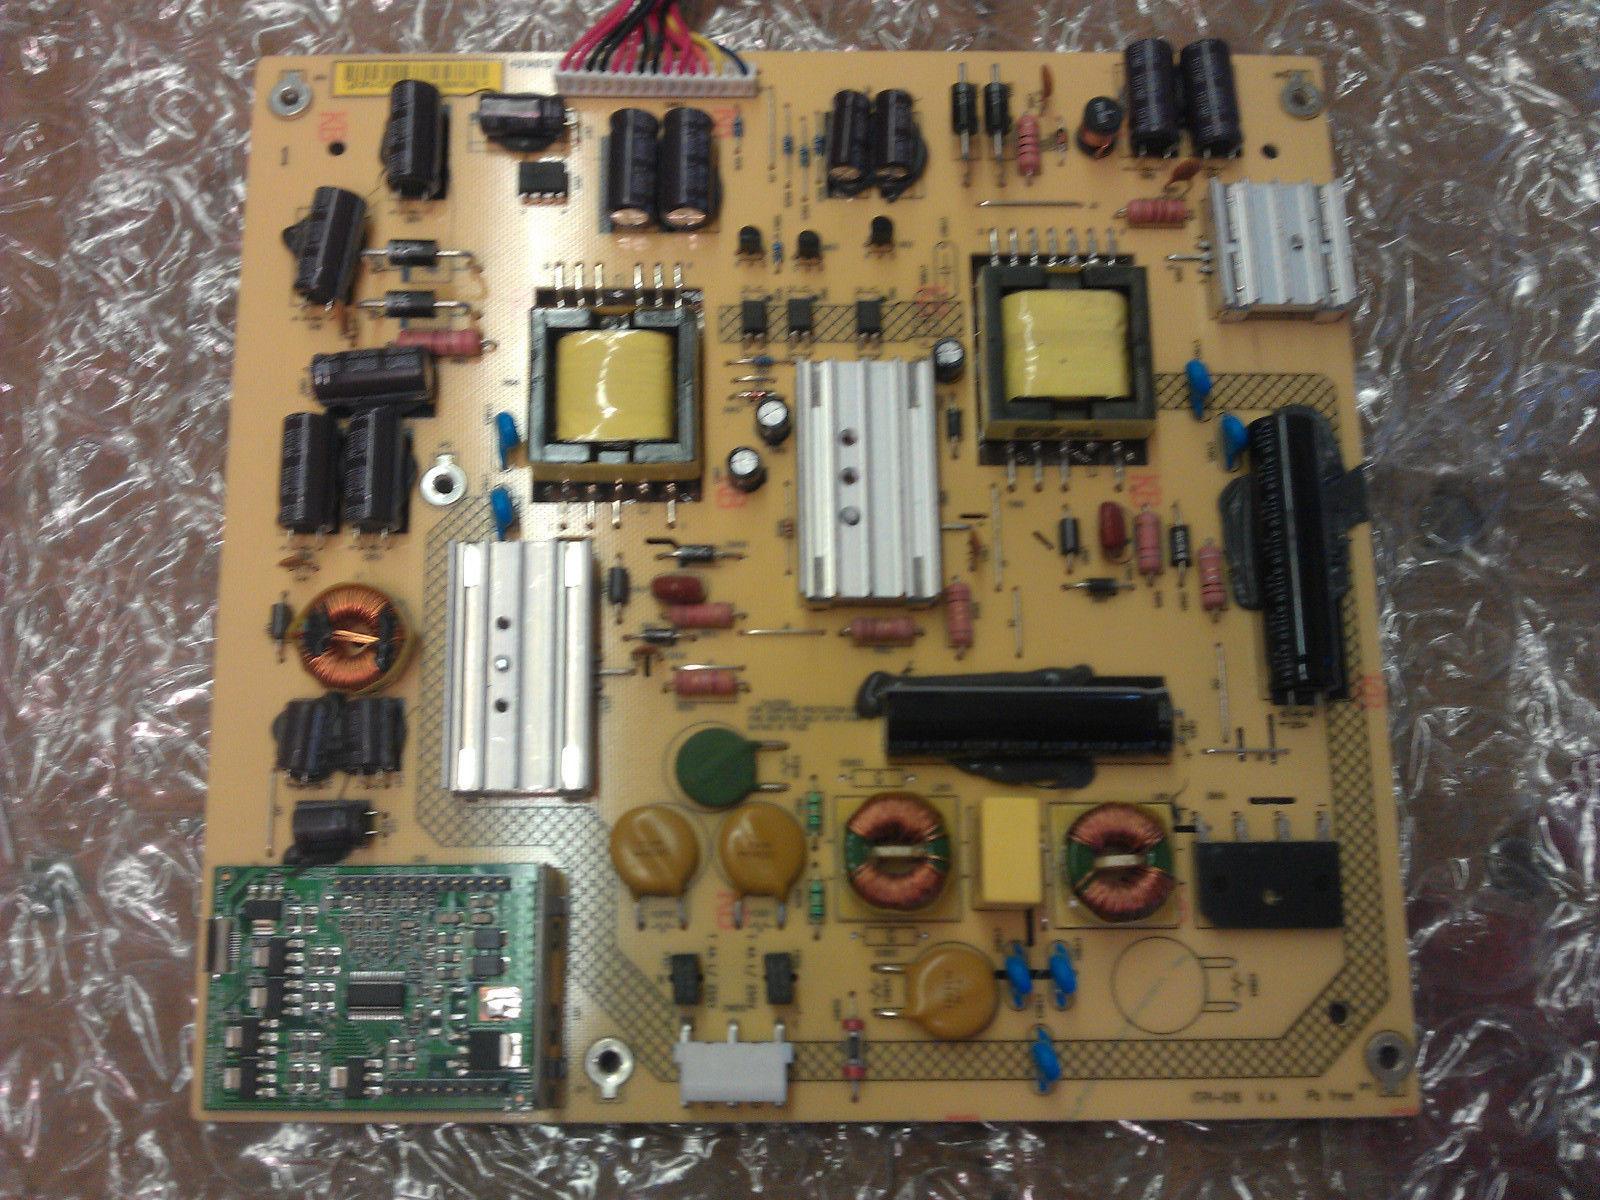 9JY796531400501R Power Supply PCB From Sharp LC-26SV490U LCD TV